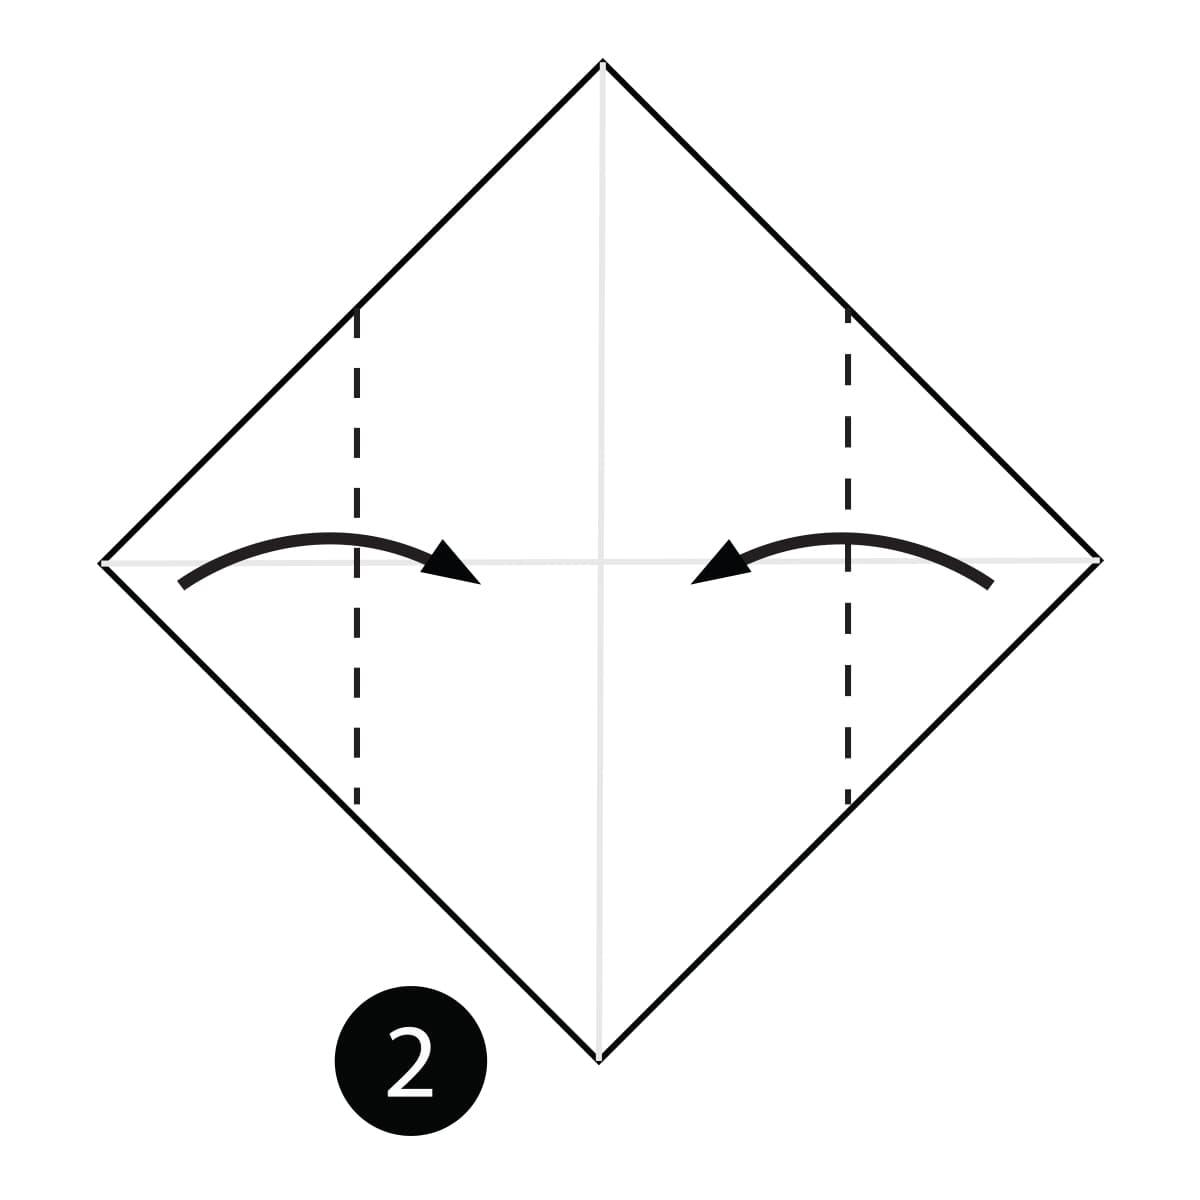 images of origami bear instructions | artosna.com | Basic origami ... | 1200x1200